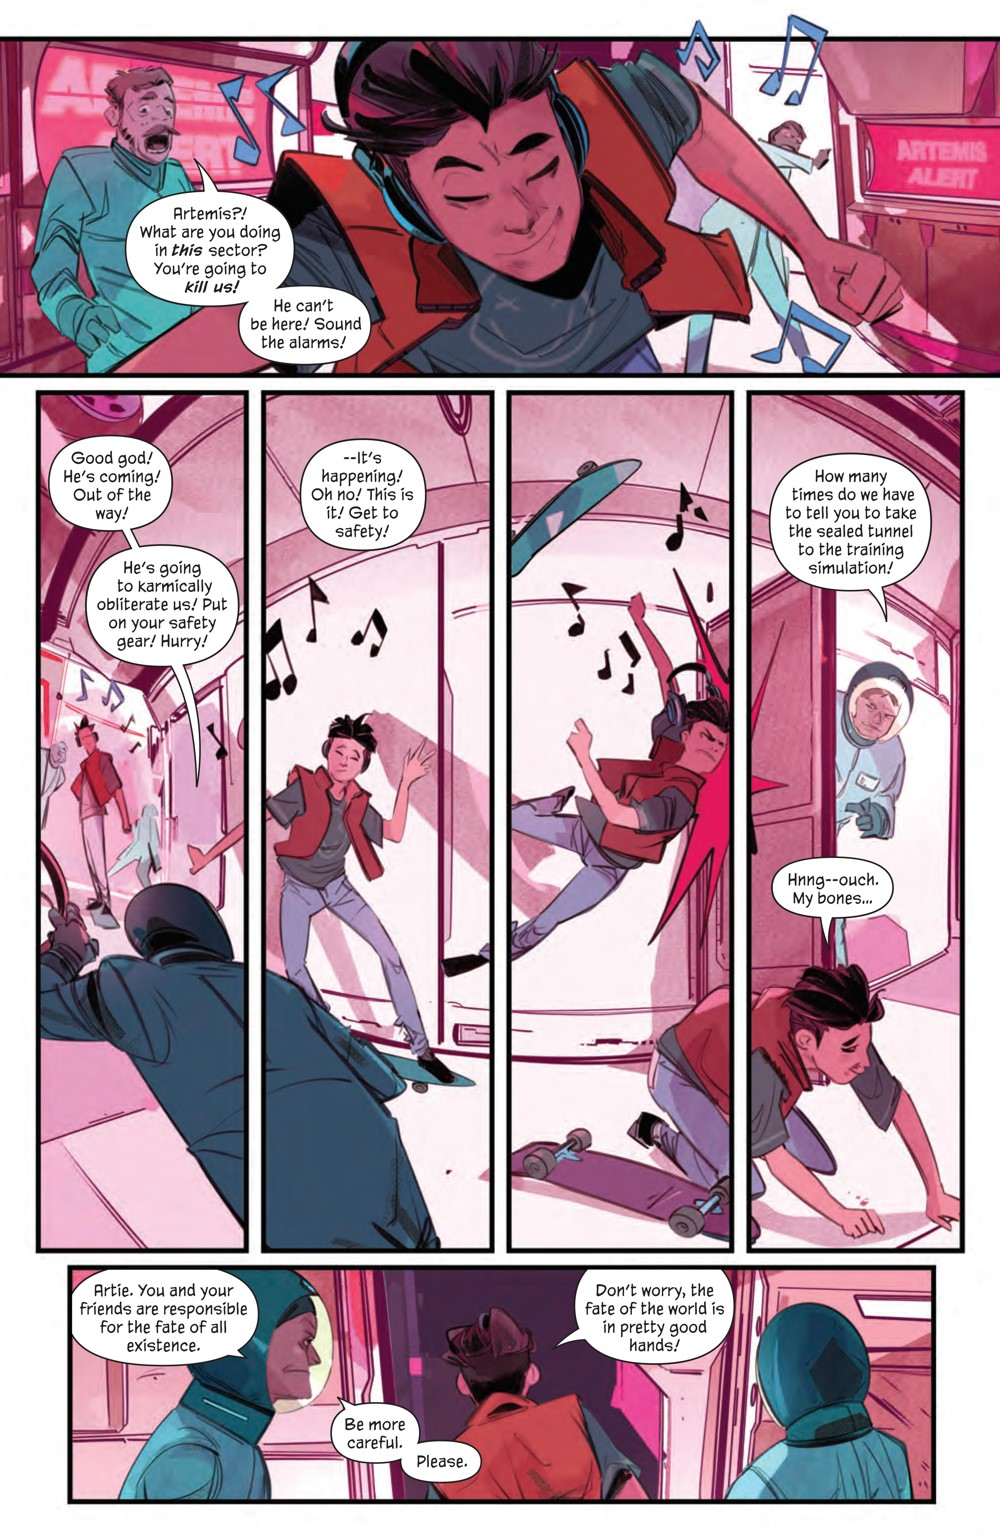 GoodLuck_001_PRESS_10 ComicList Previews: GOOD LUCK #1 (OF 5)